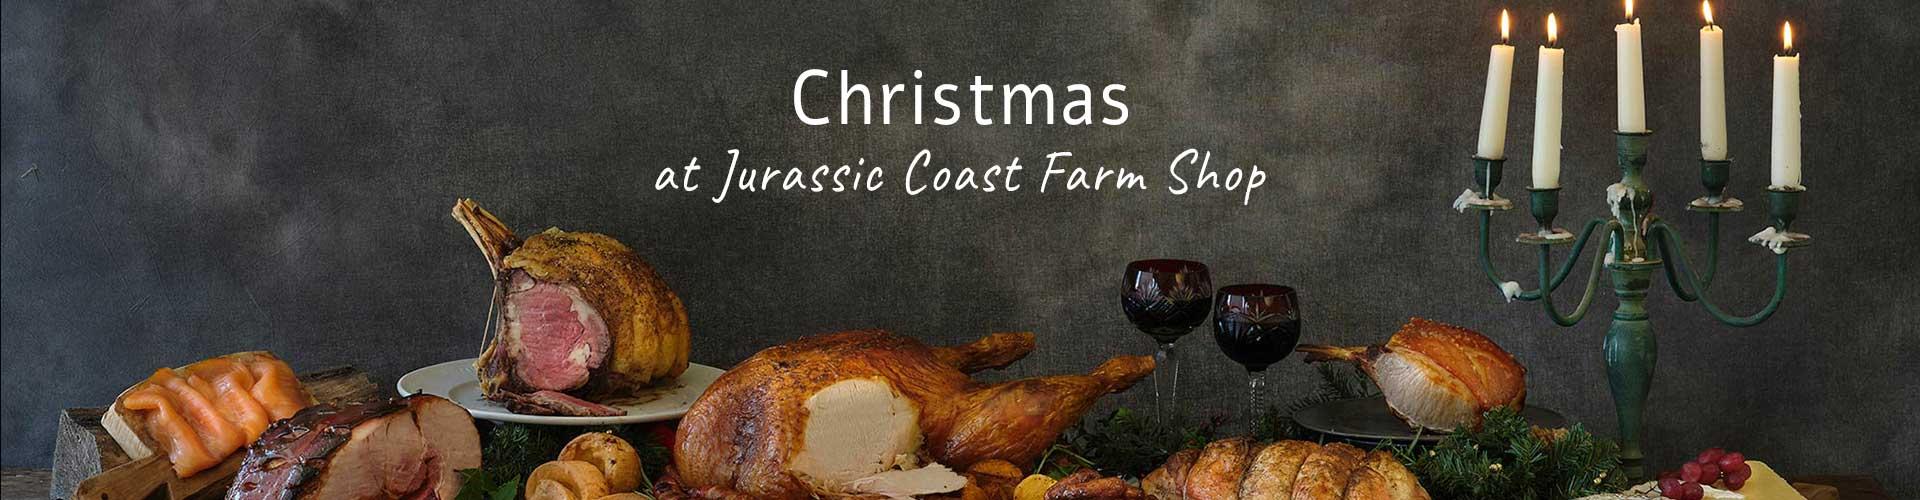 Christmas at Jurassic Coast Farm Shop